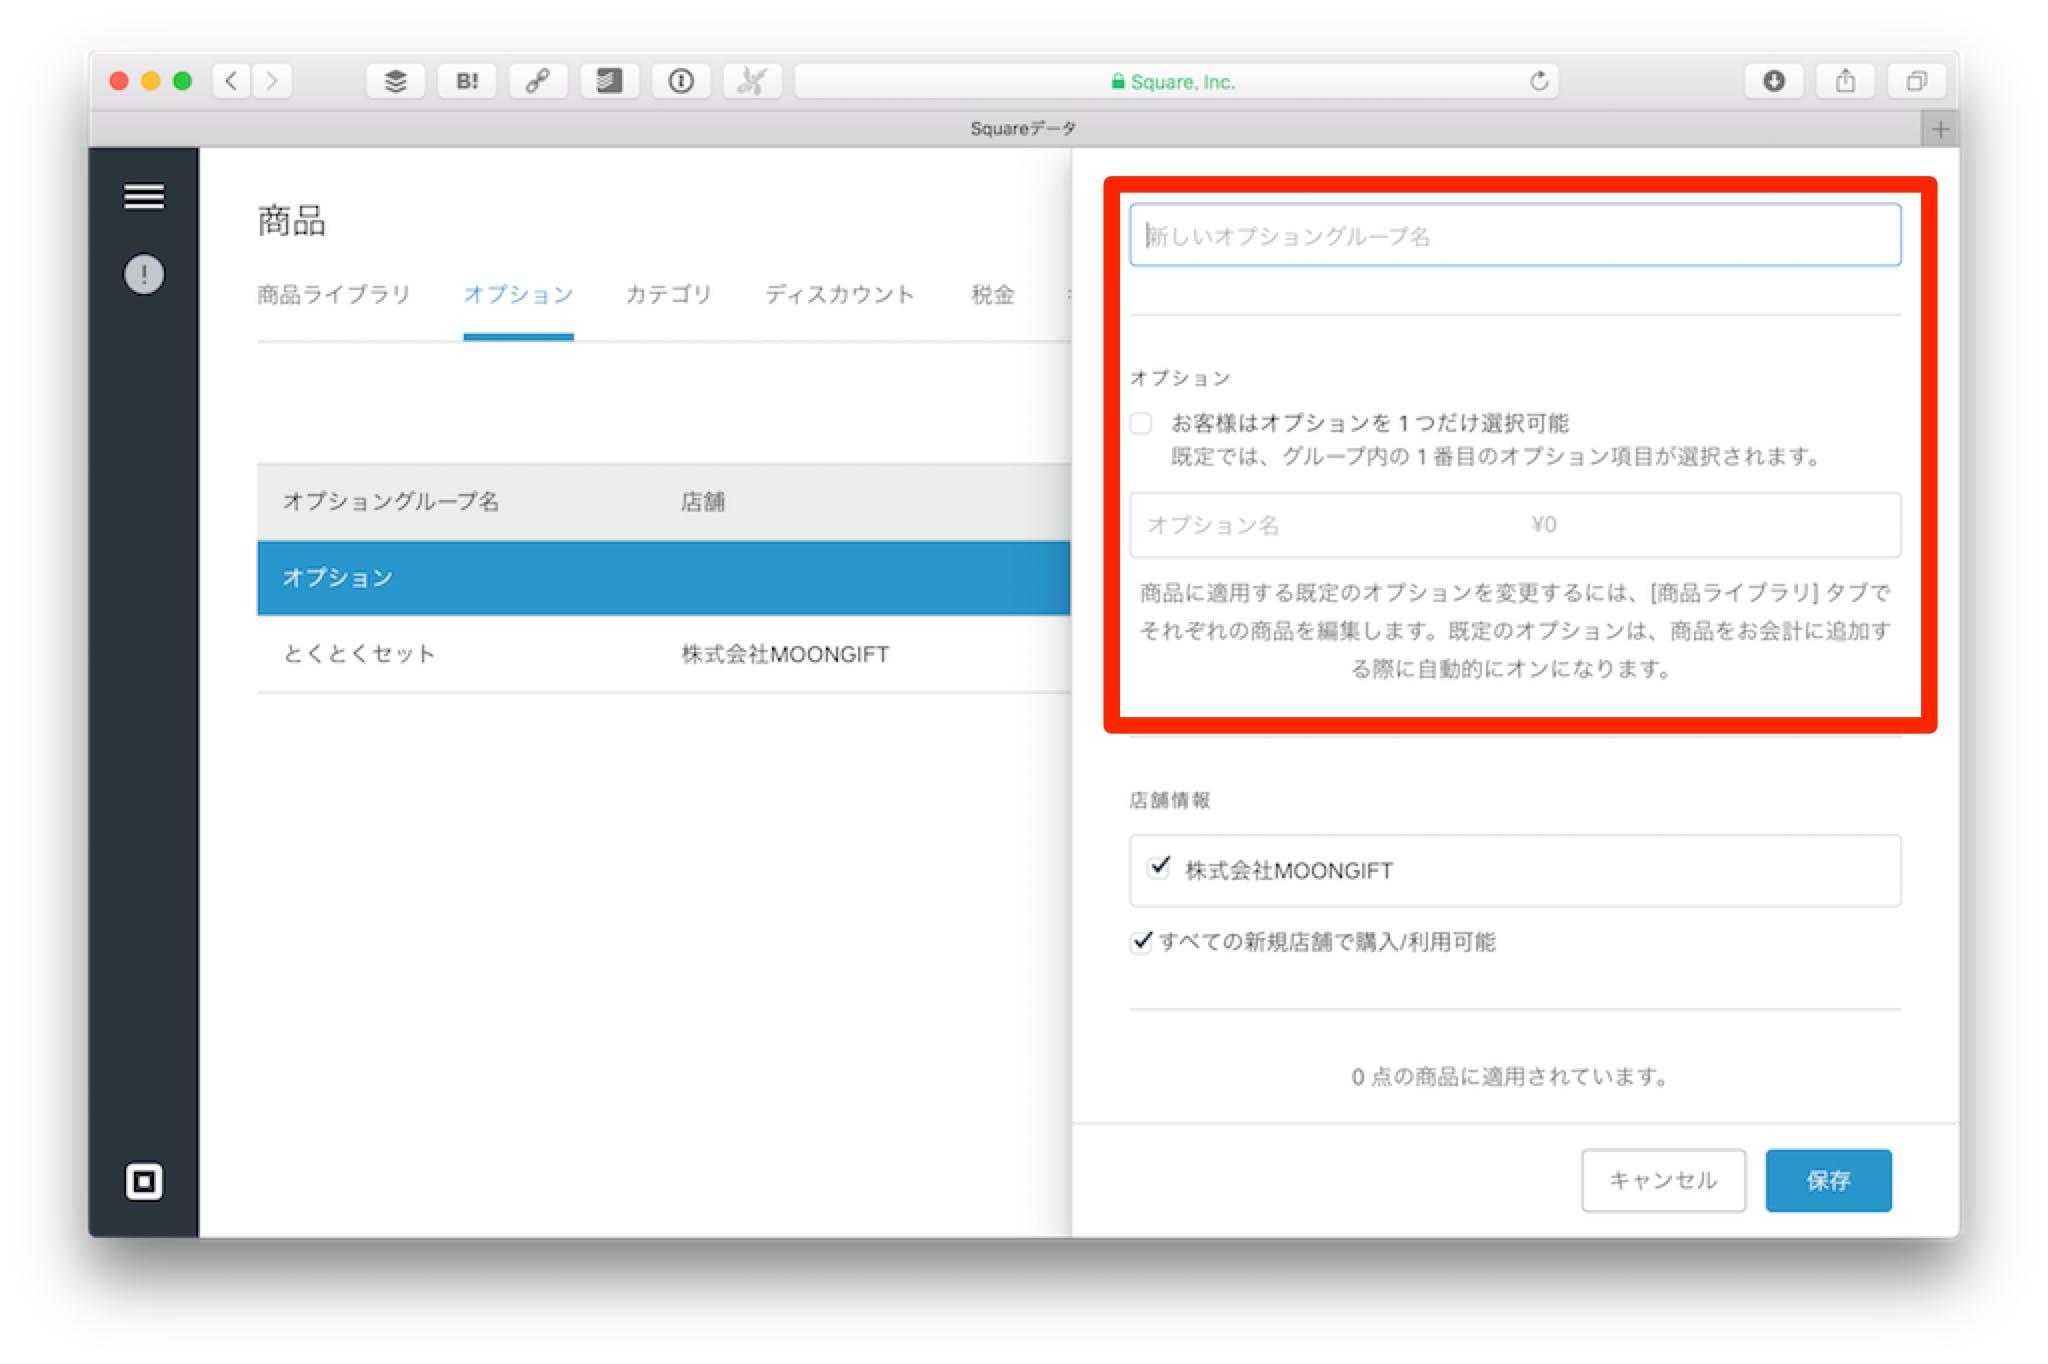 Screenshot_ 2017-11-25 11.09.54.png